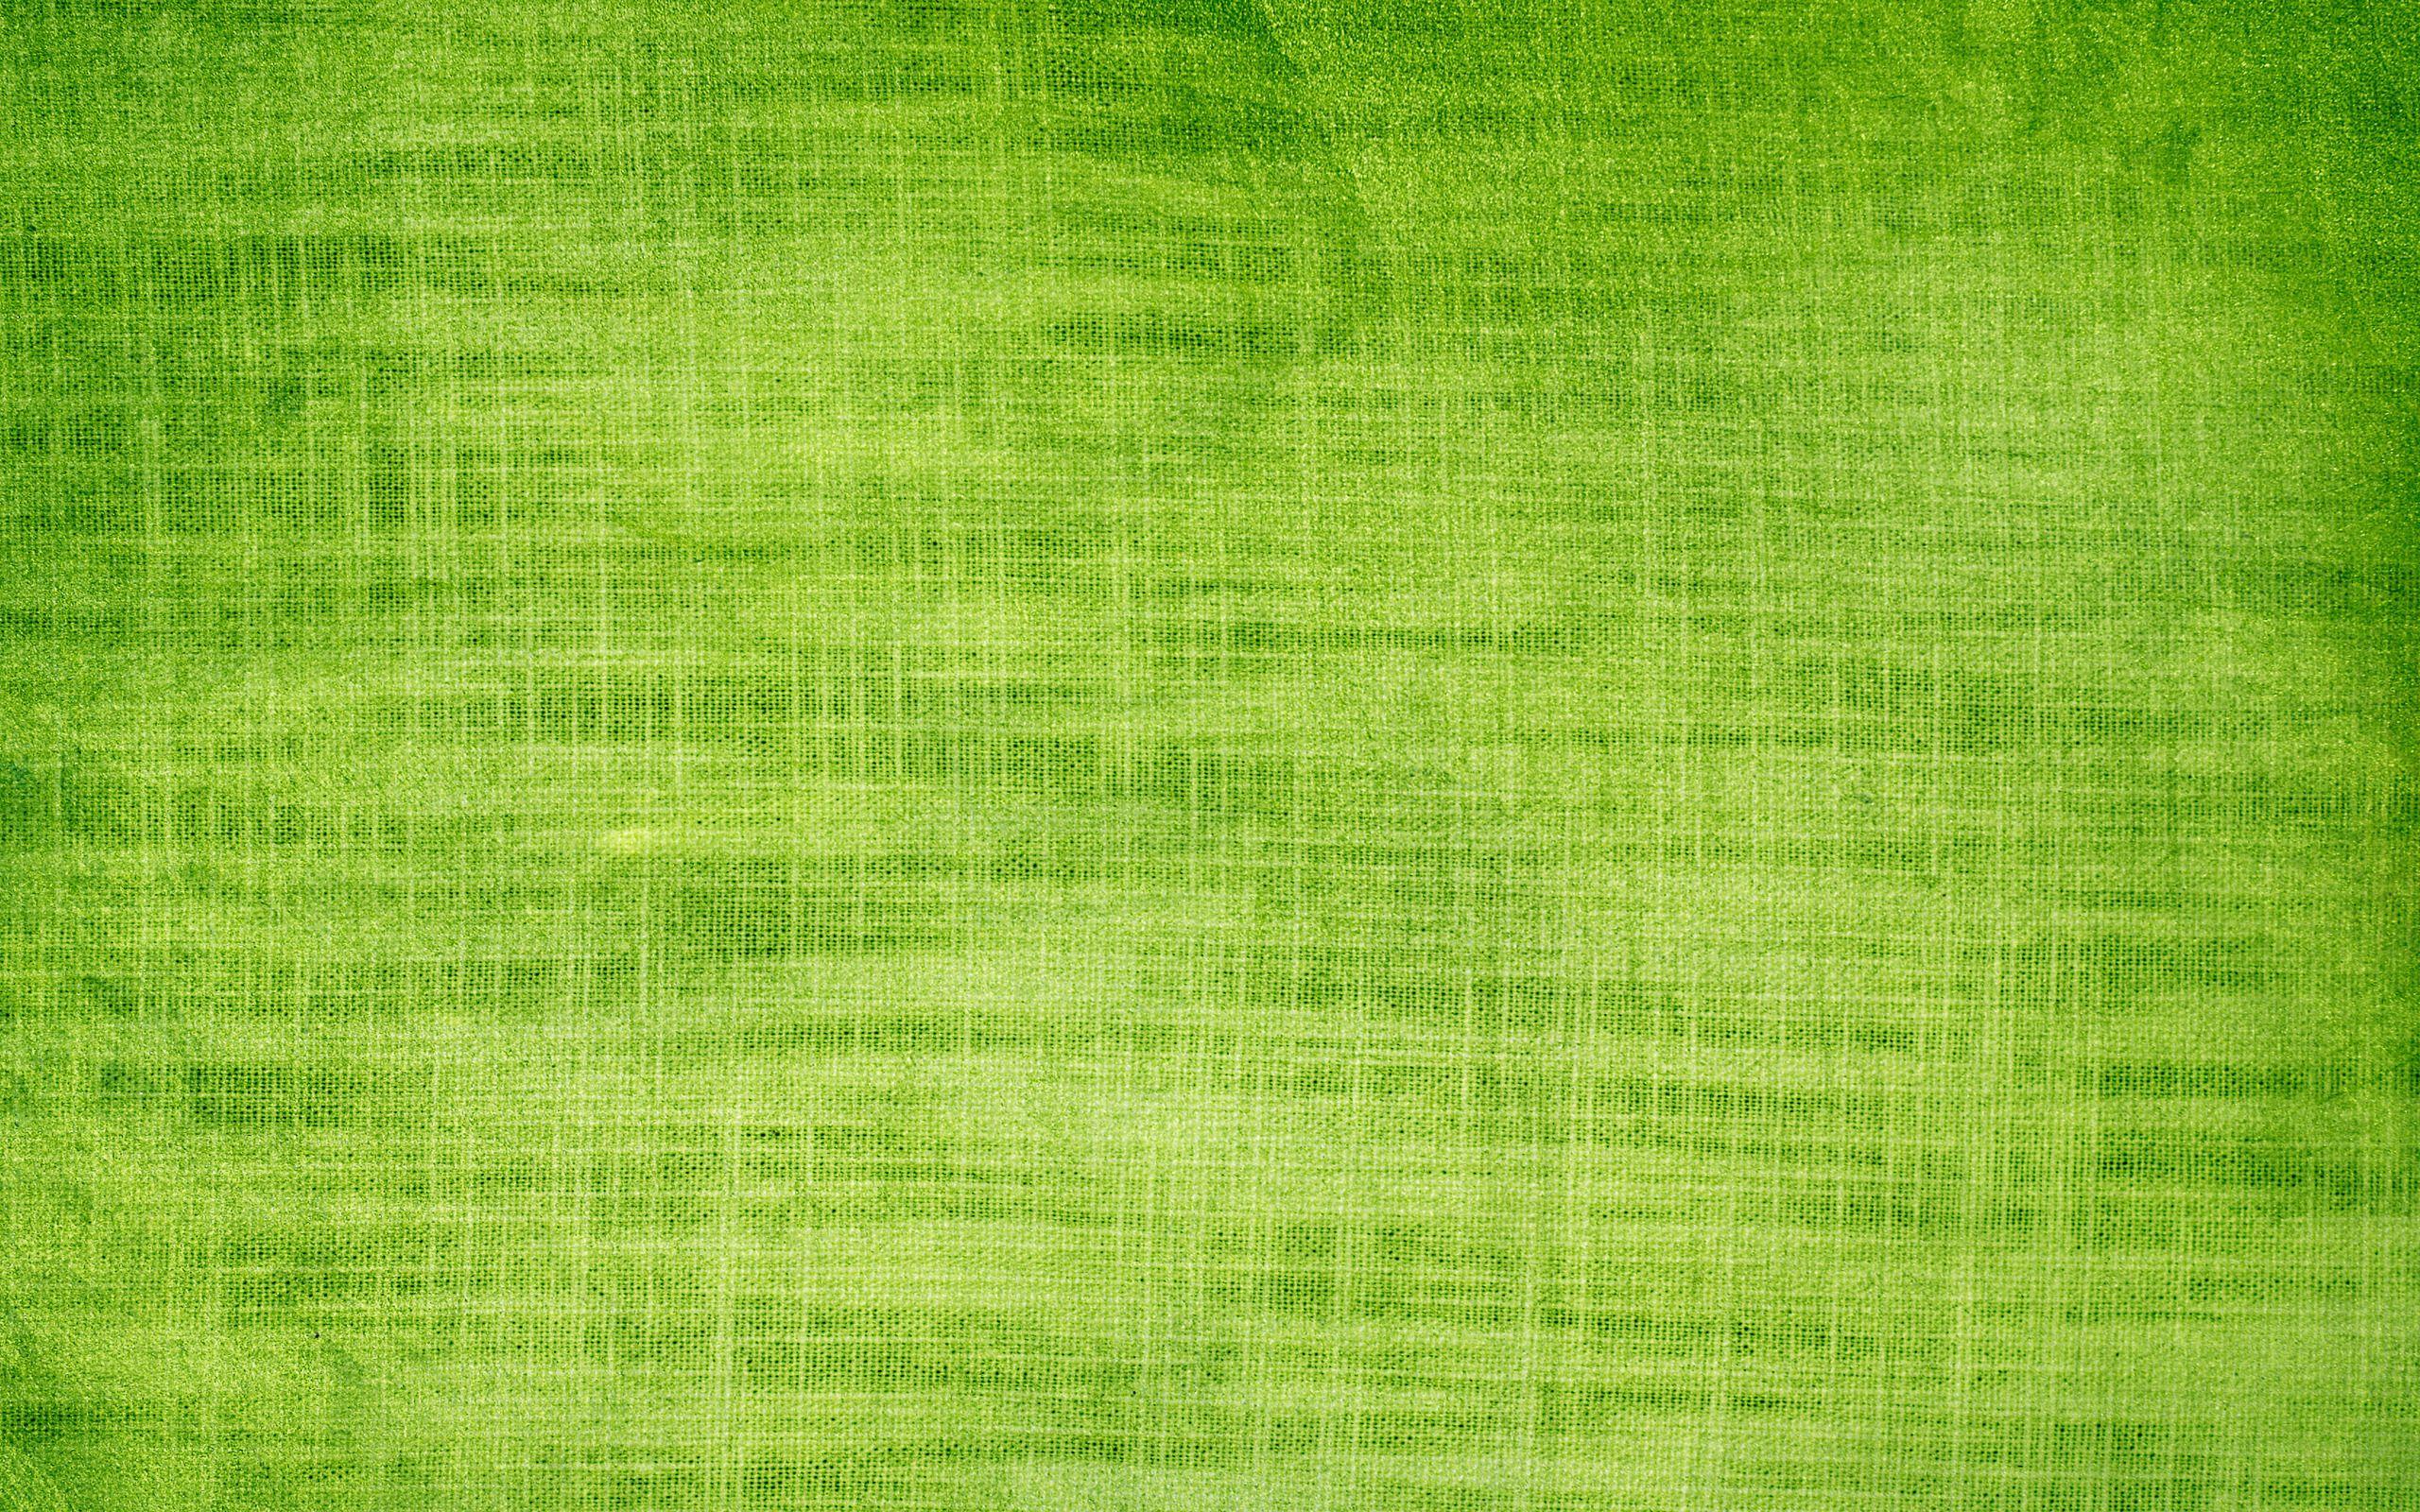 green textures - Google Search | textures | Pinterest | Artwork